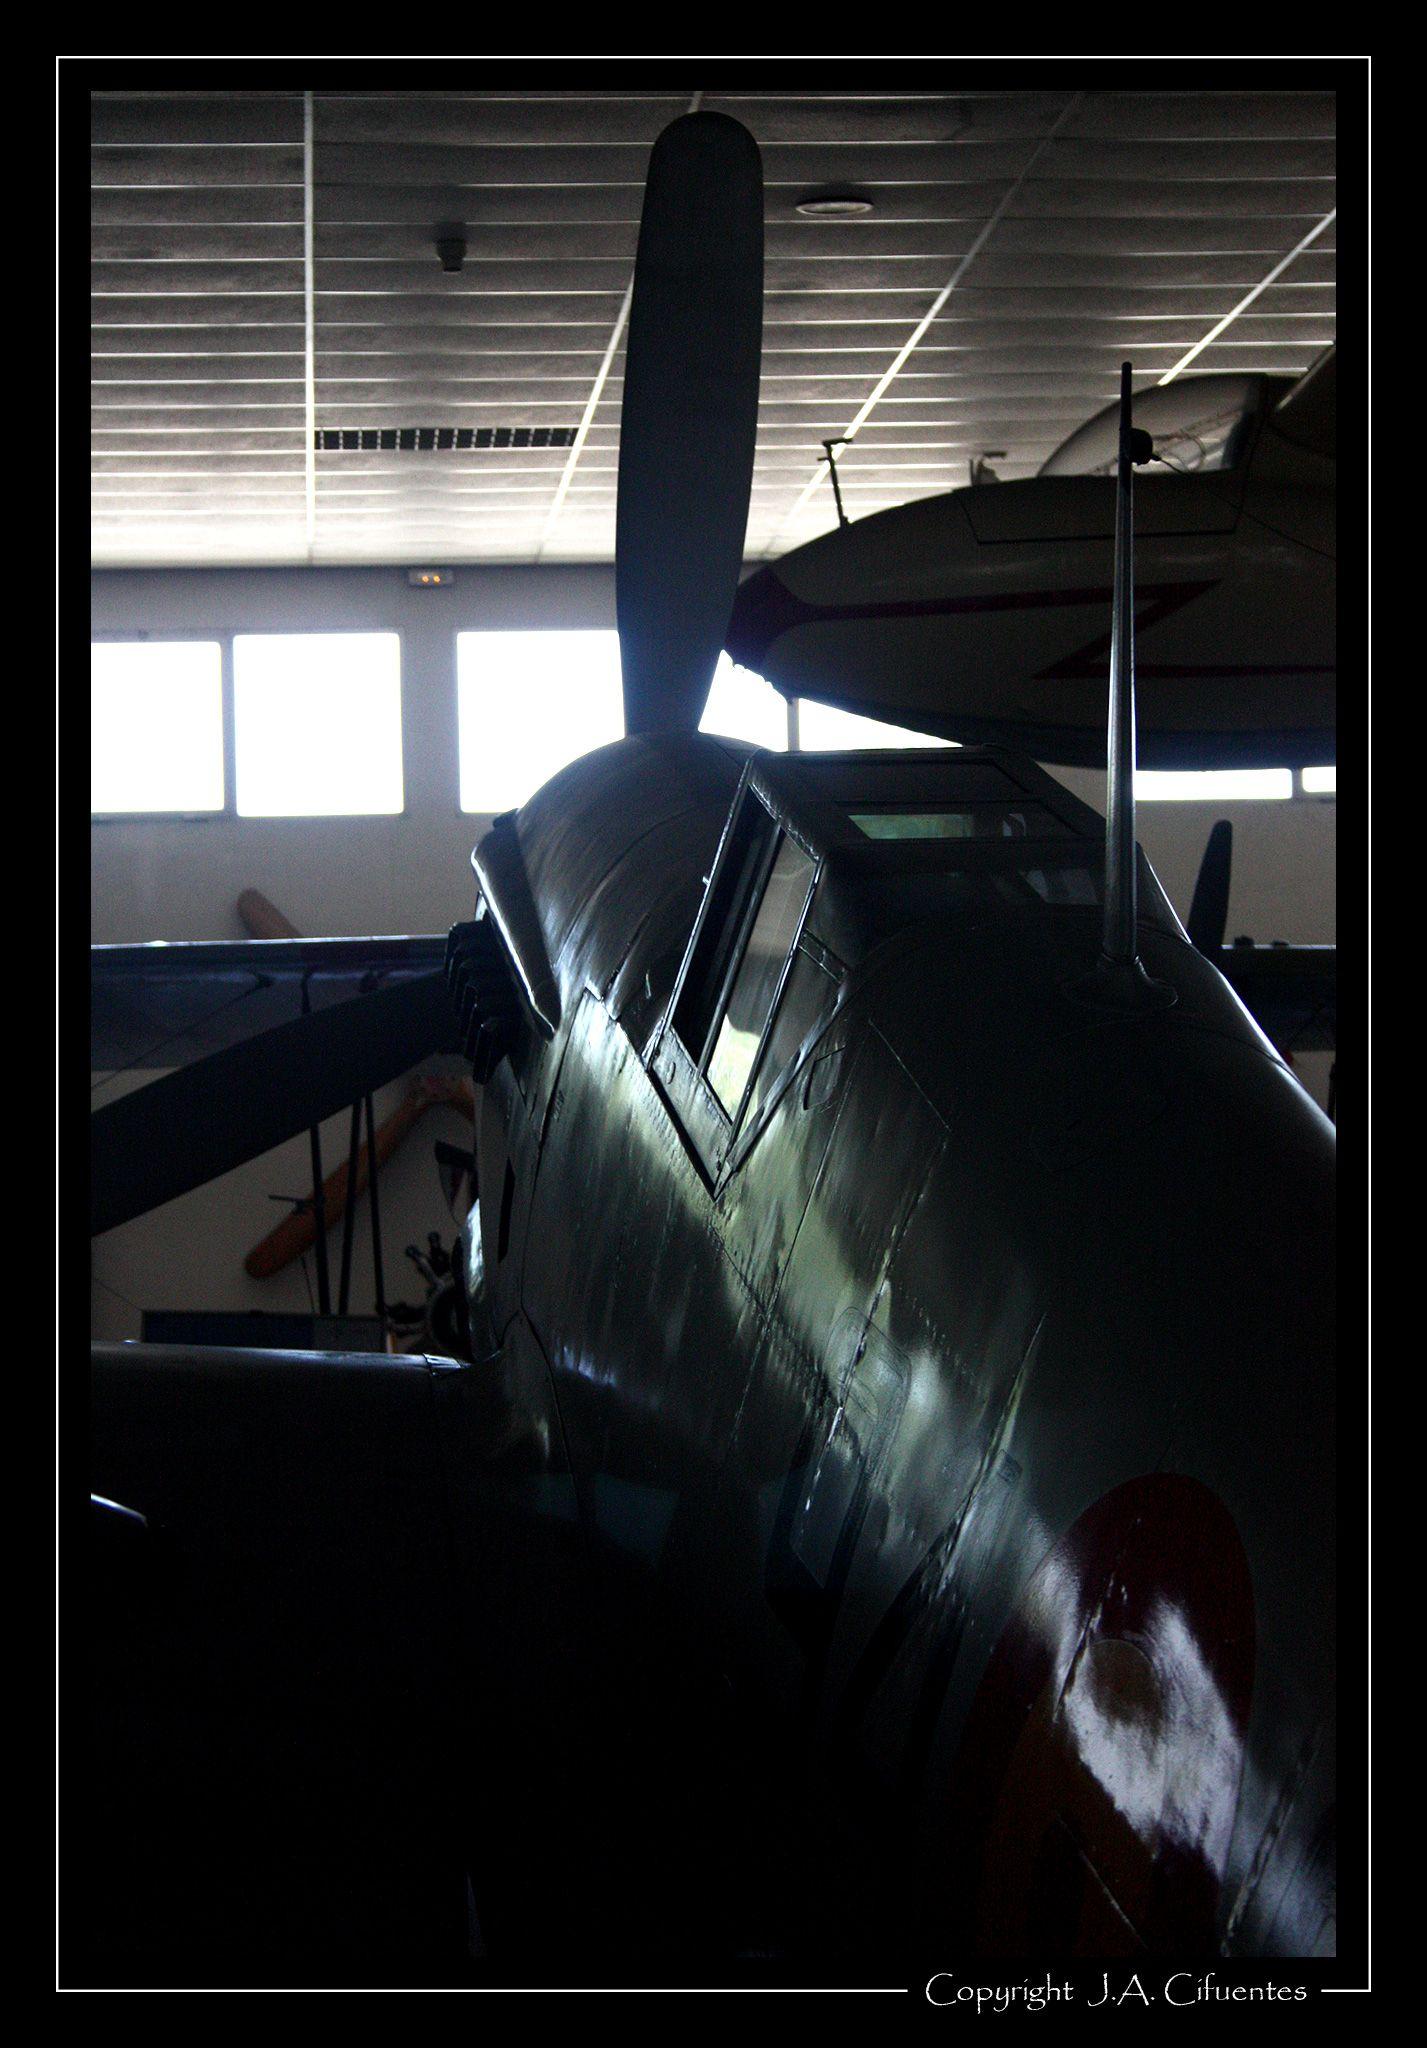 Hispano Aviación HA-1109 J-1L.